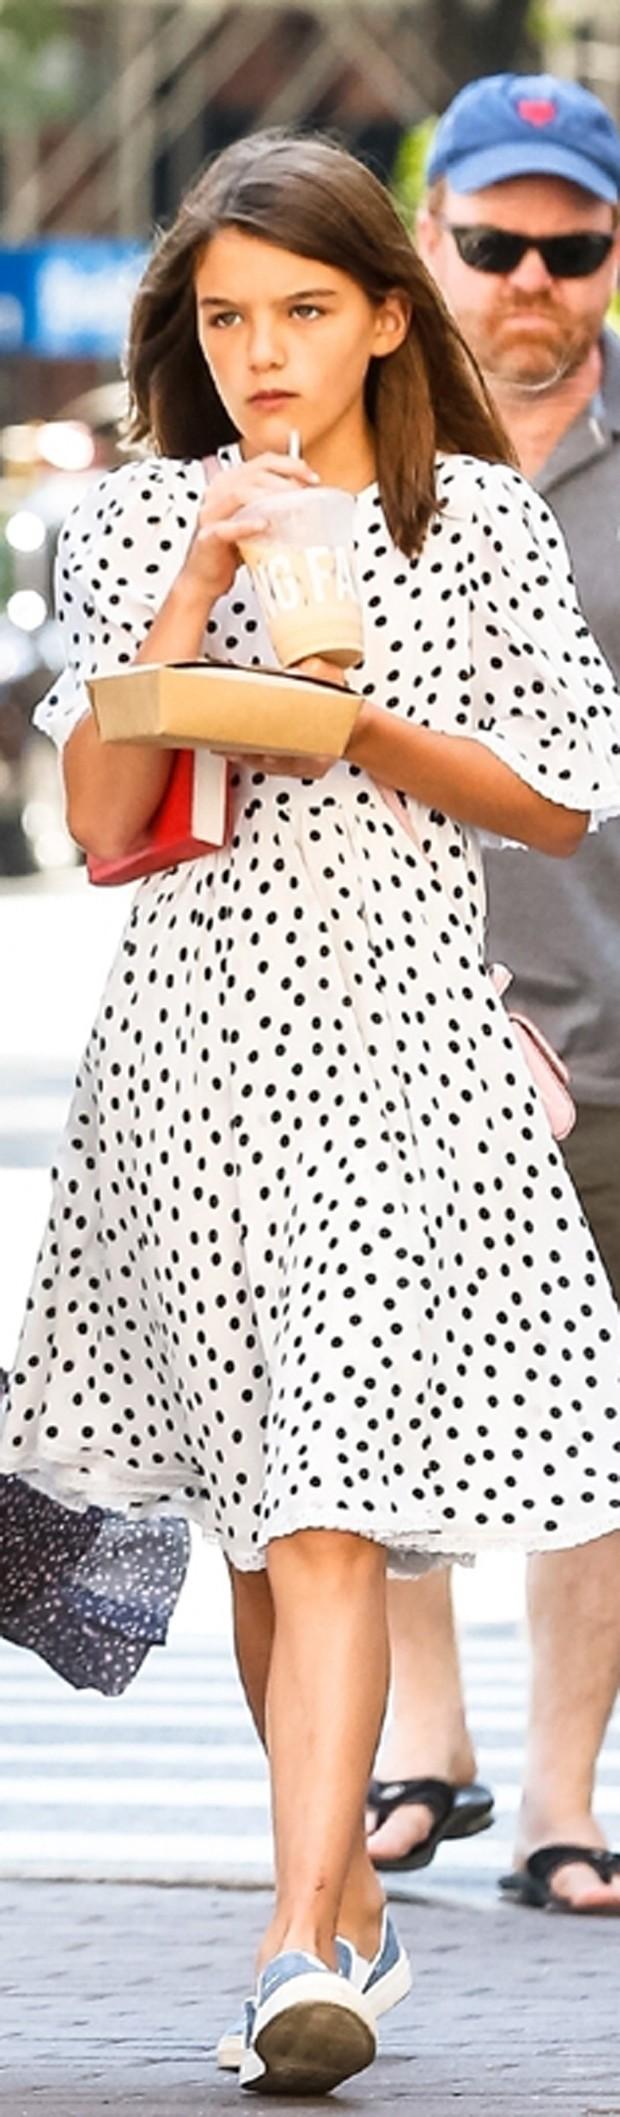 Suri é ícone fashion desde bebê  (Foto: Backgrid)